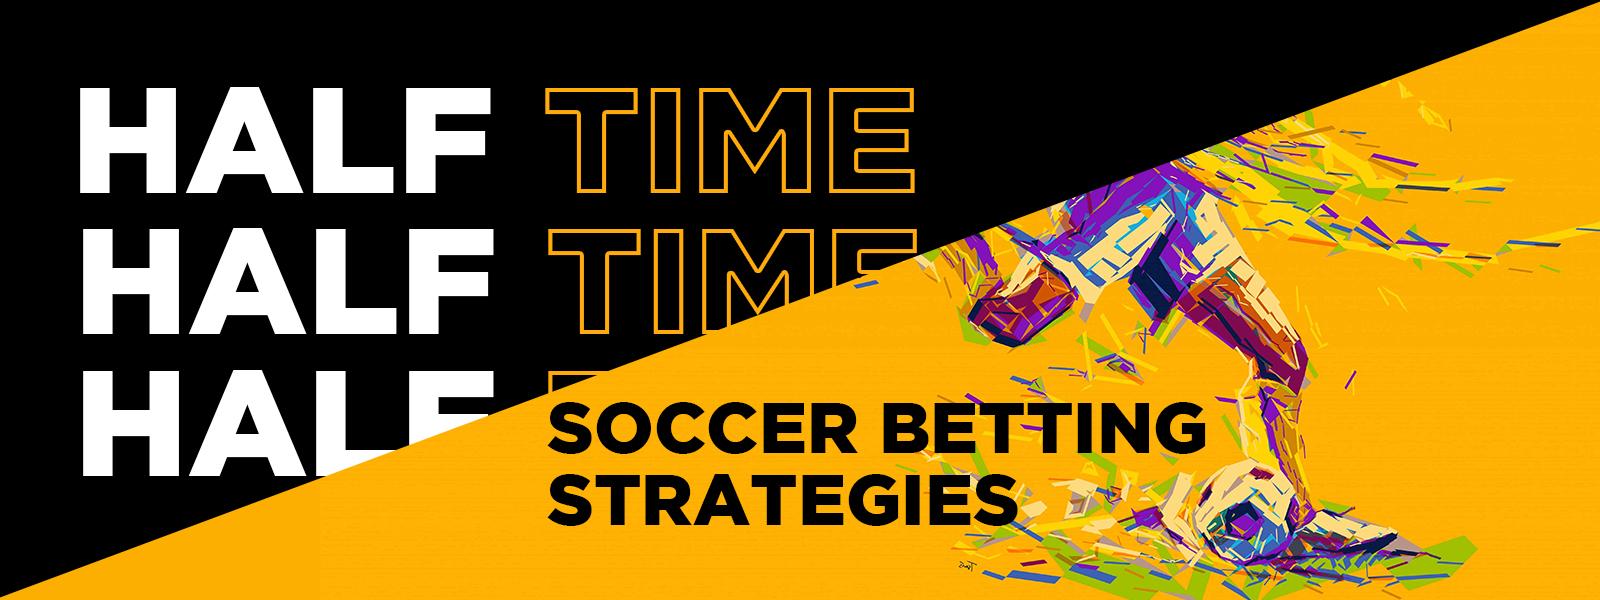 Half Time Soccer Betting Strategies